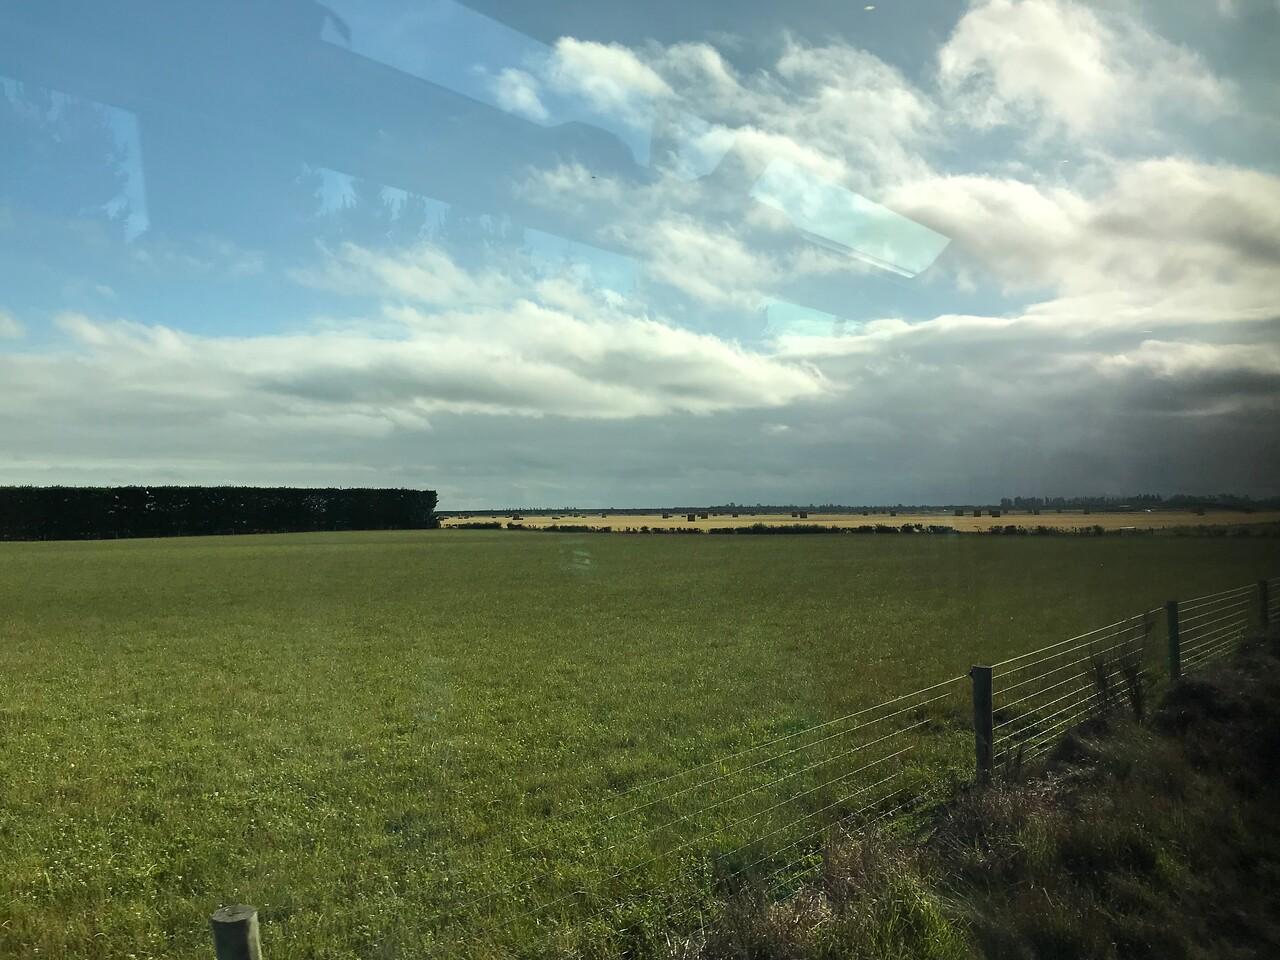 2018-03-05 - 34 Tranz Alpine Kiwi Rail NZ